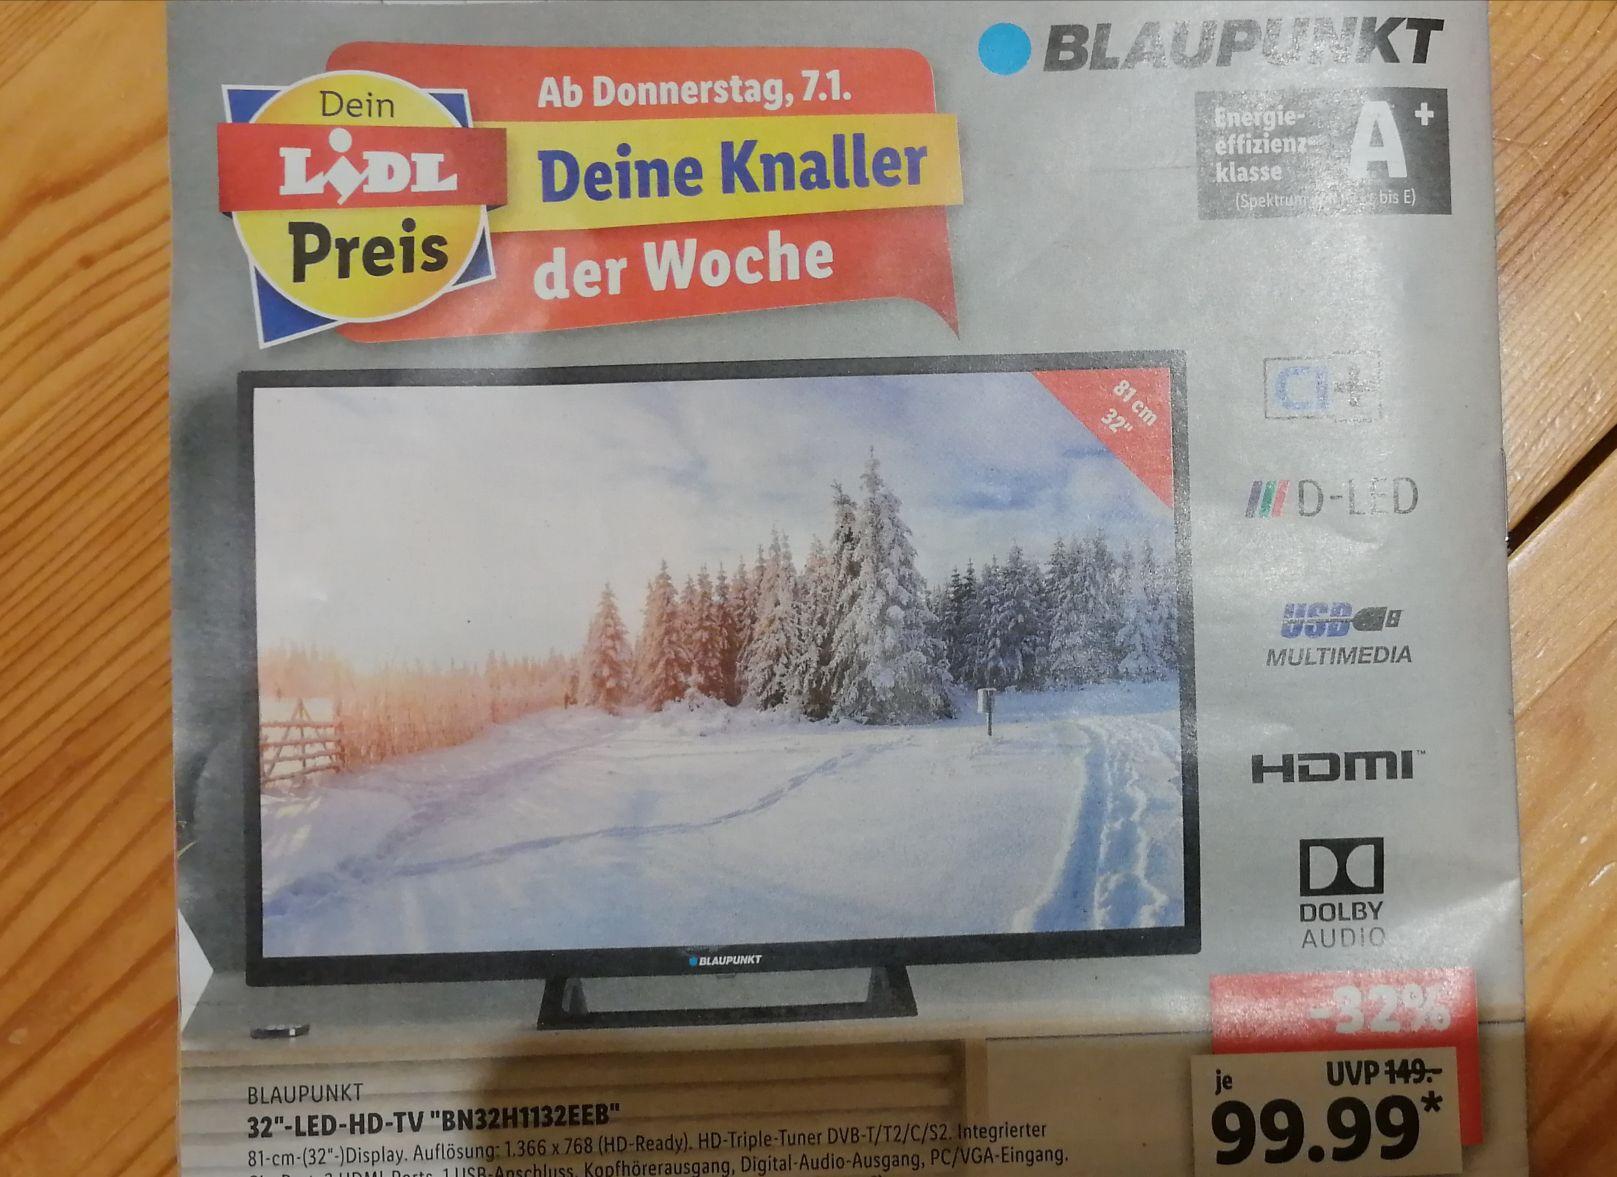 Blaupunkt 32 Zoll LED HD TV bei Lidl ab 07.01.2021